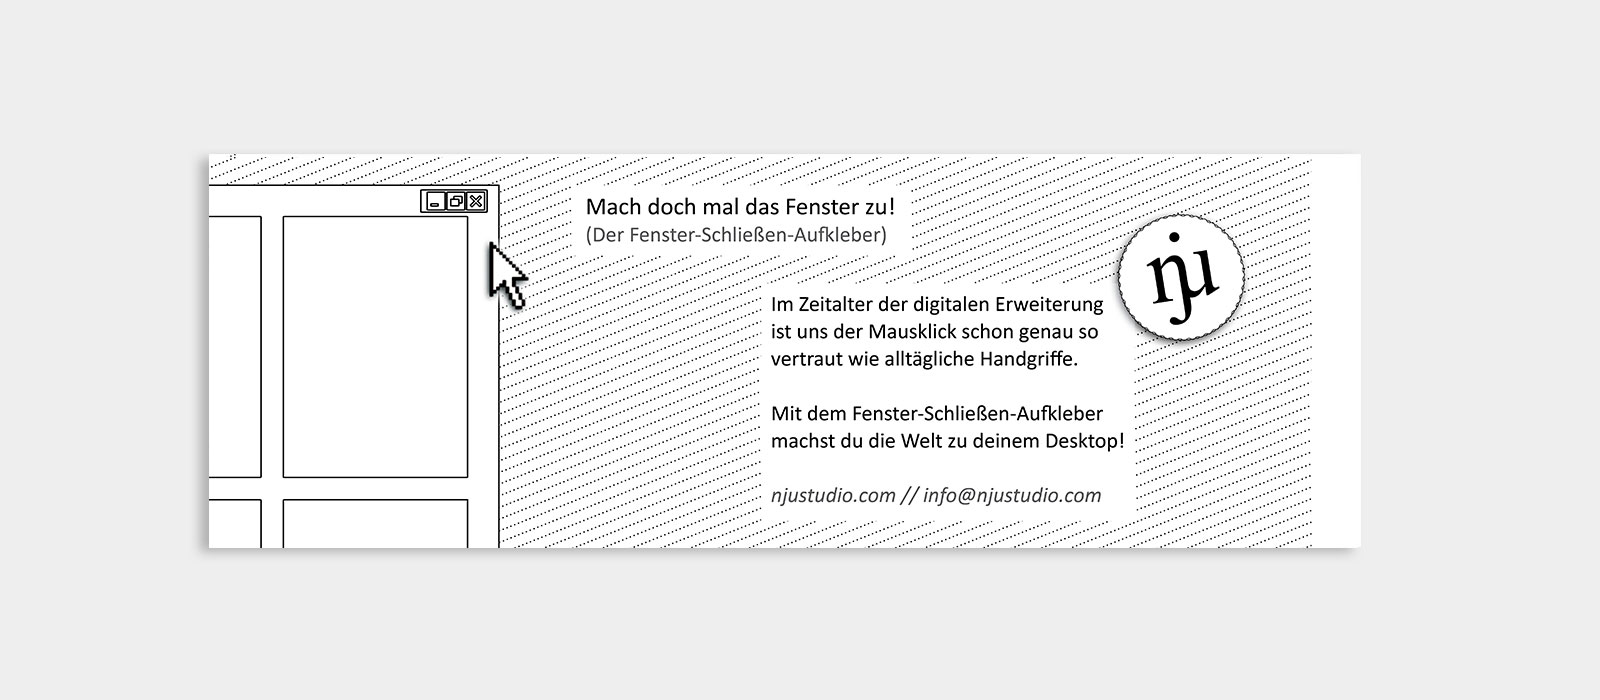 njustudio_fenster-schliessen2